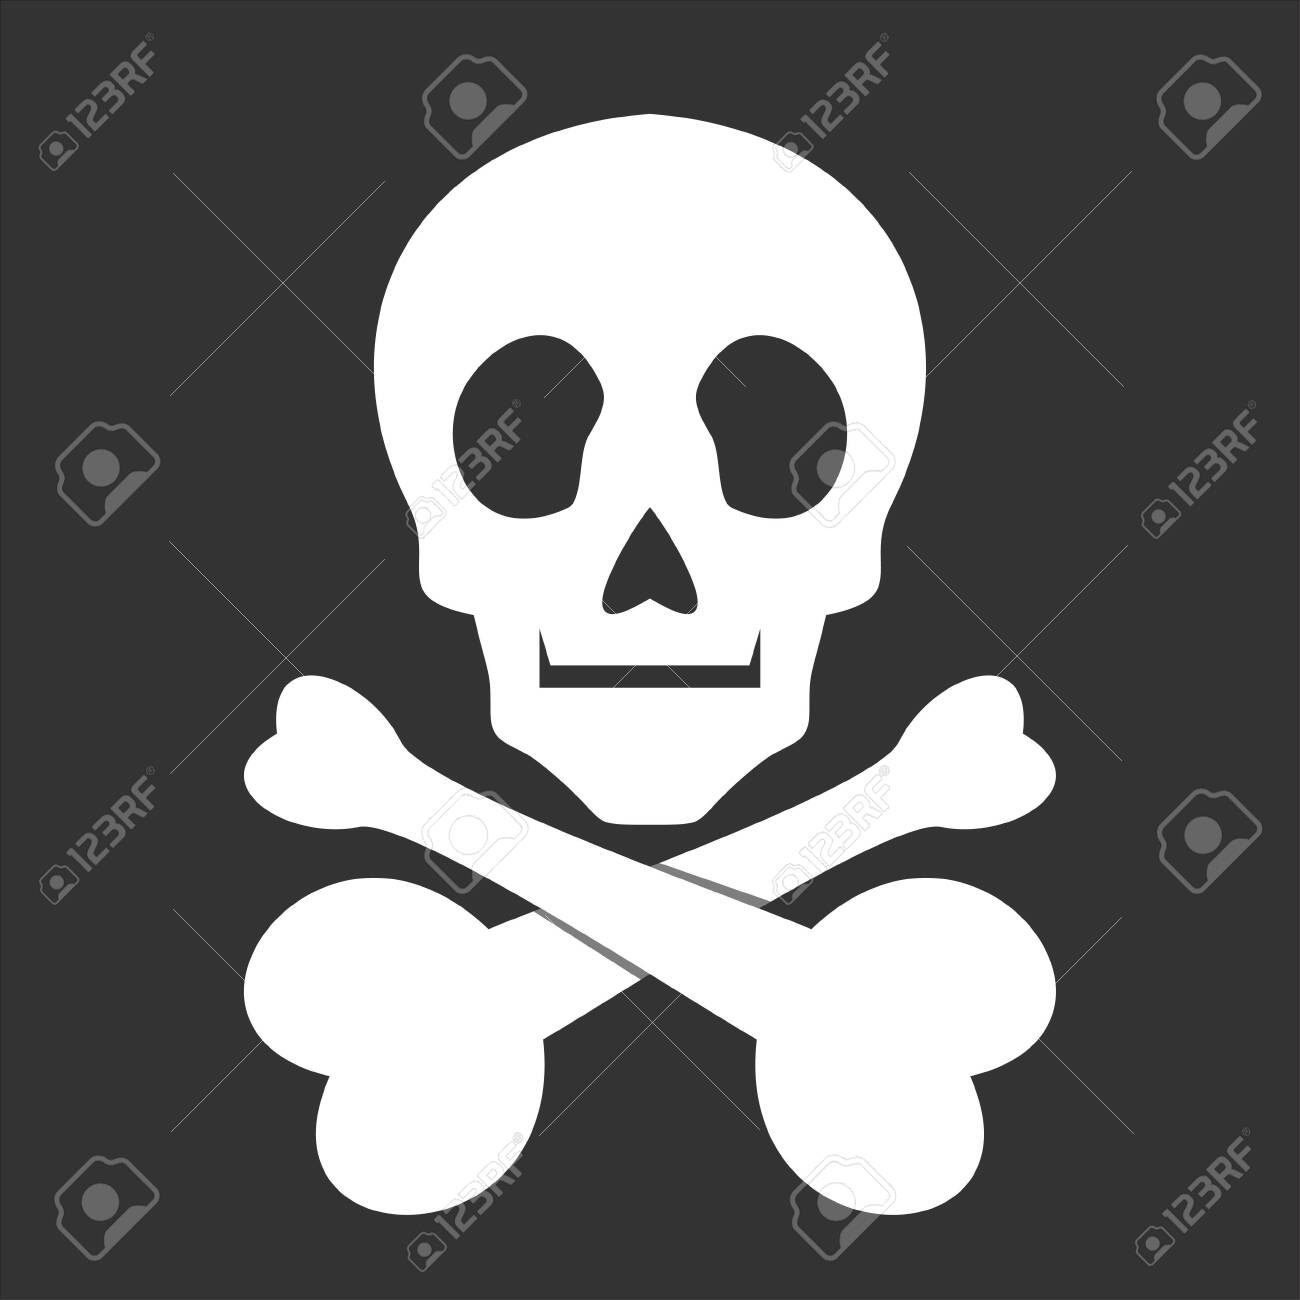 skull icon - 135878919